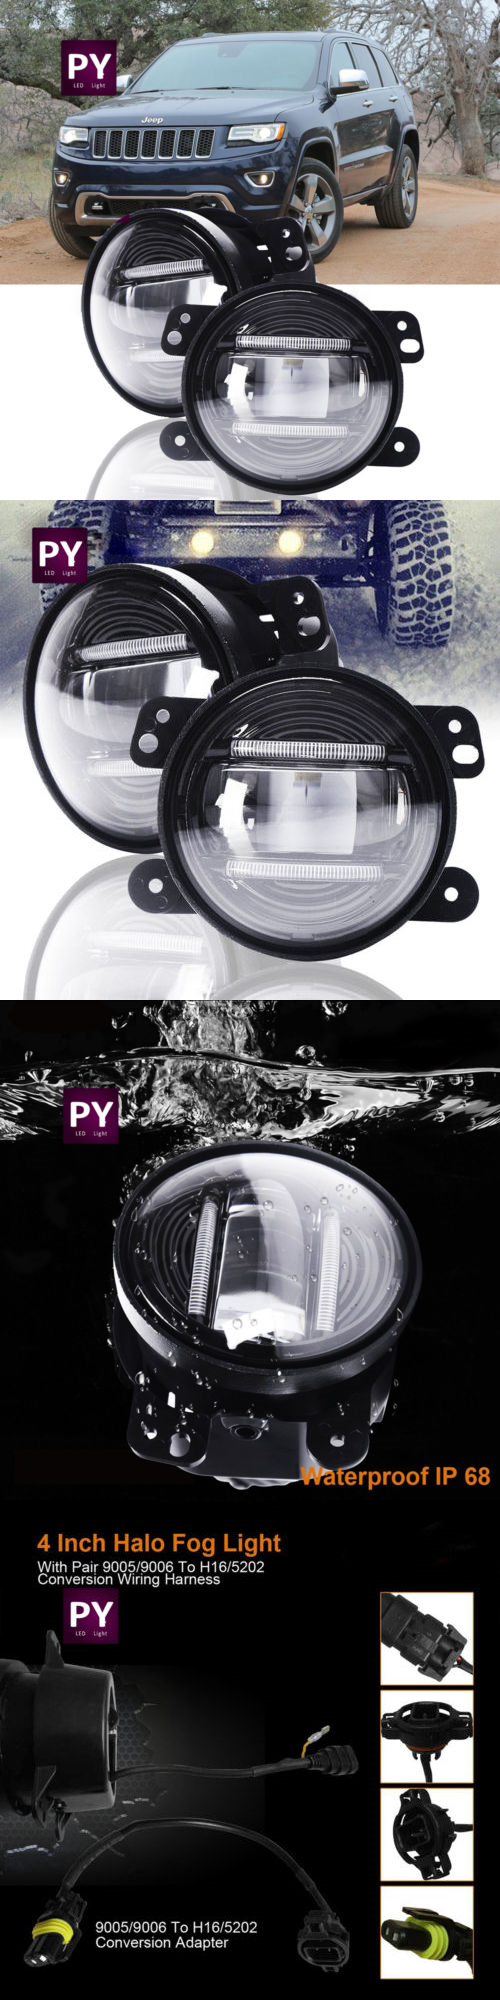 Car Lighting Led Fog Lamps Driving Lights 2011 2012 2013 Universal Light Wiring Harness Ebay 2014 Jeep Grand